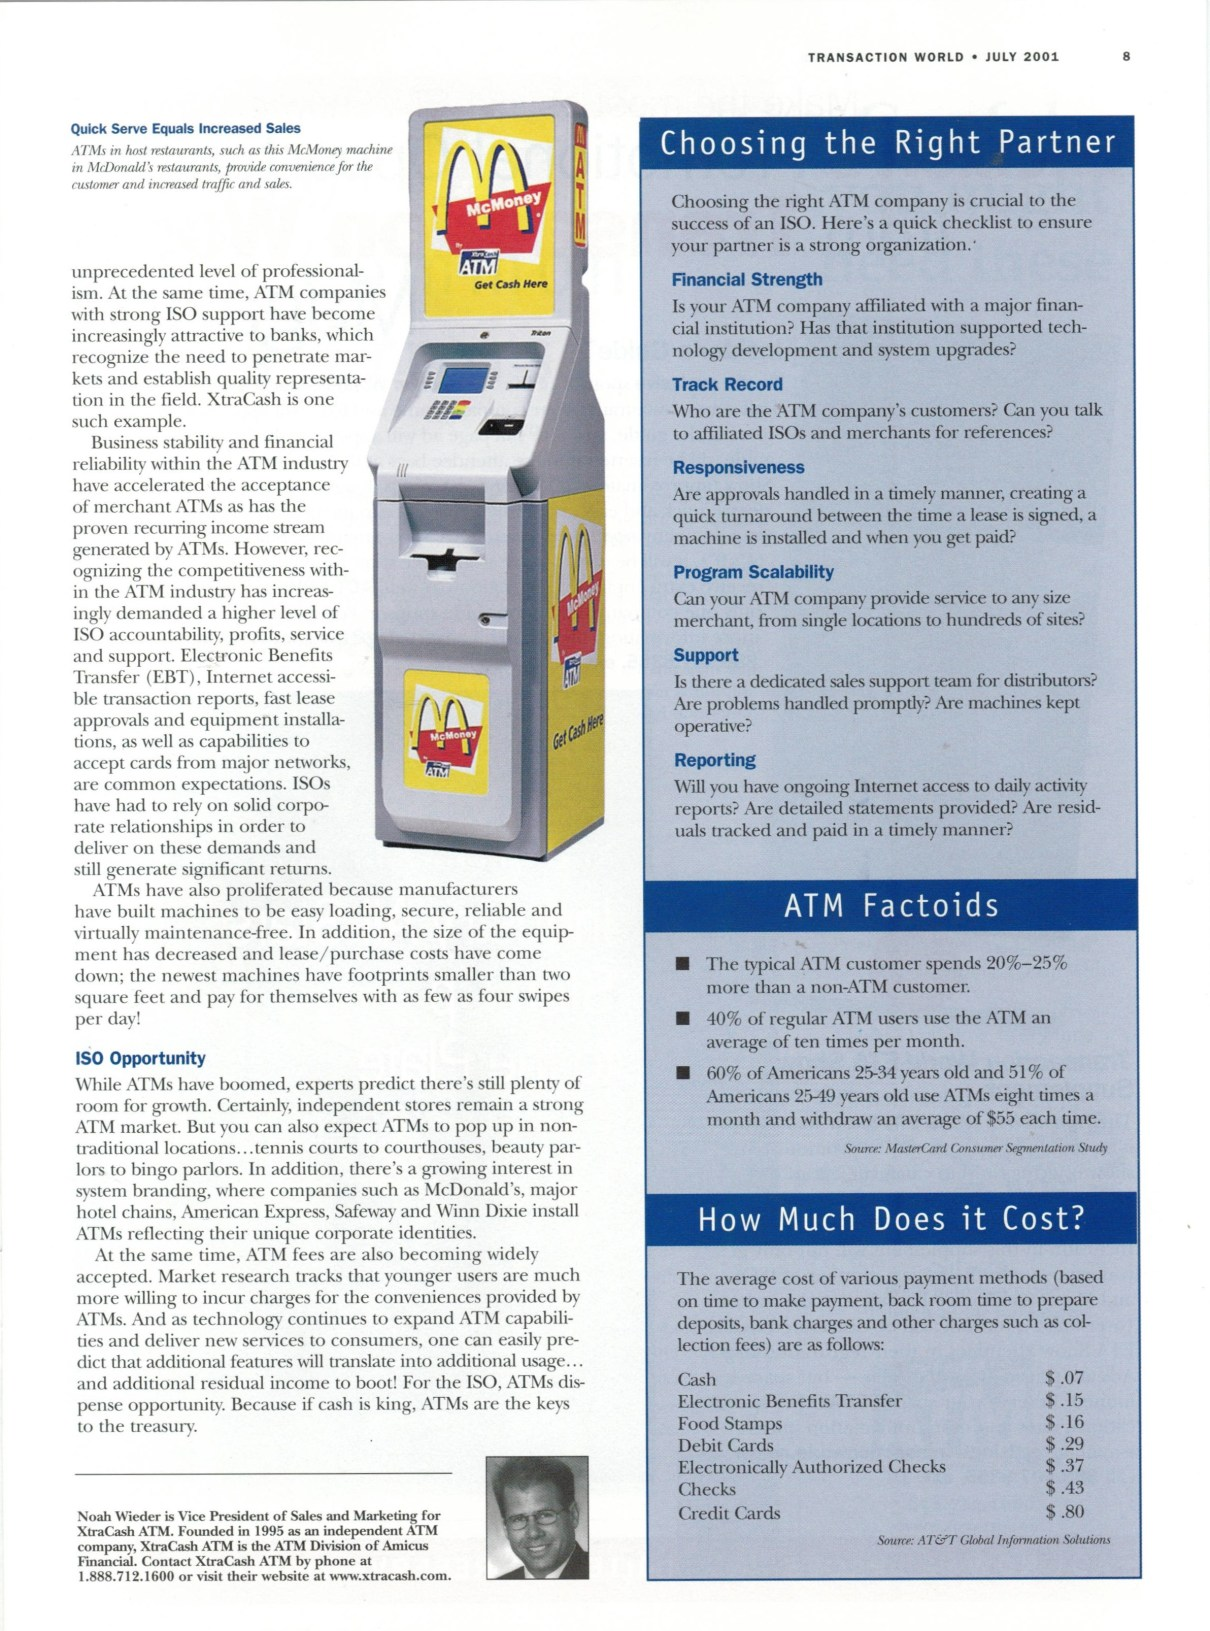 Transaction World Magazine Volume 1, Issue 6, 2001 page 8